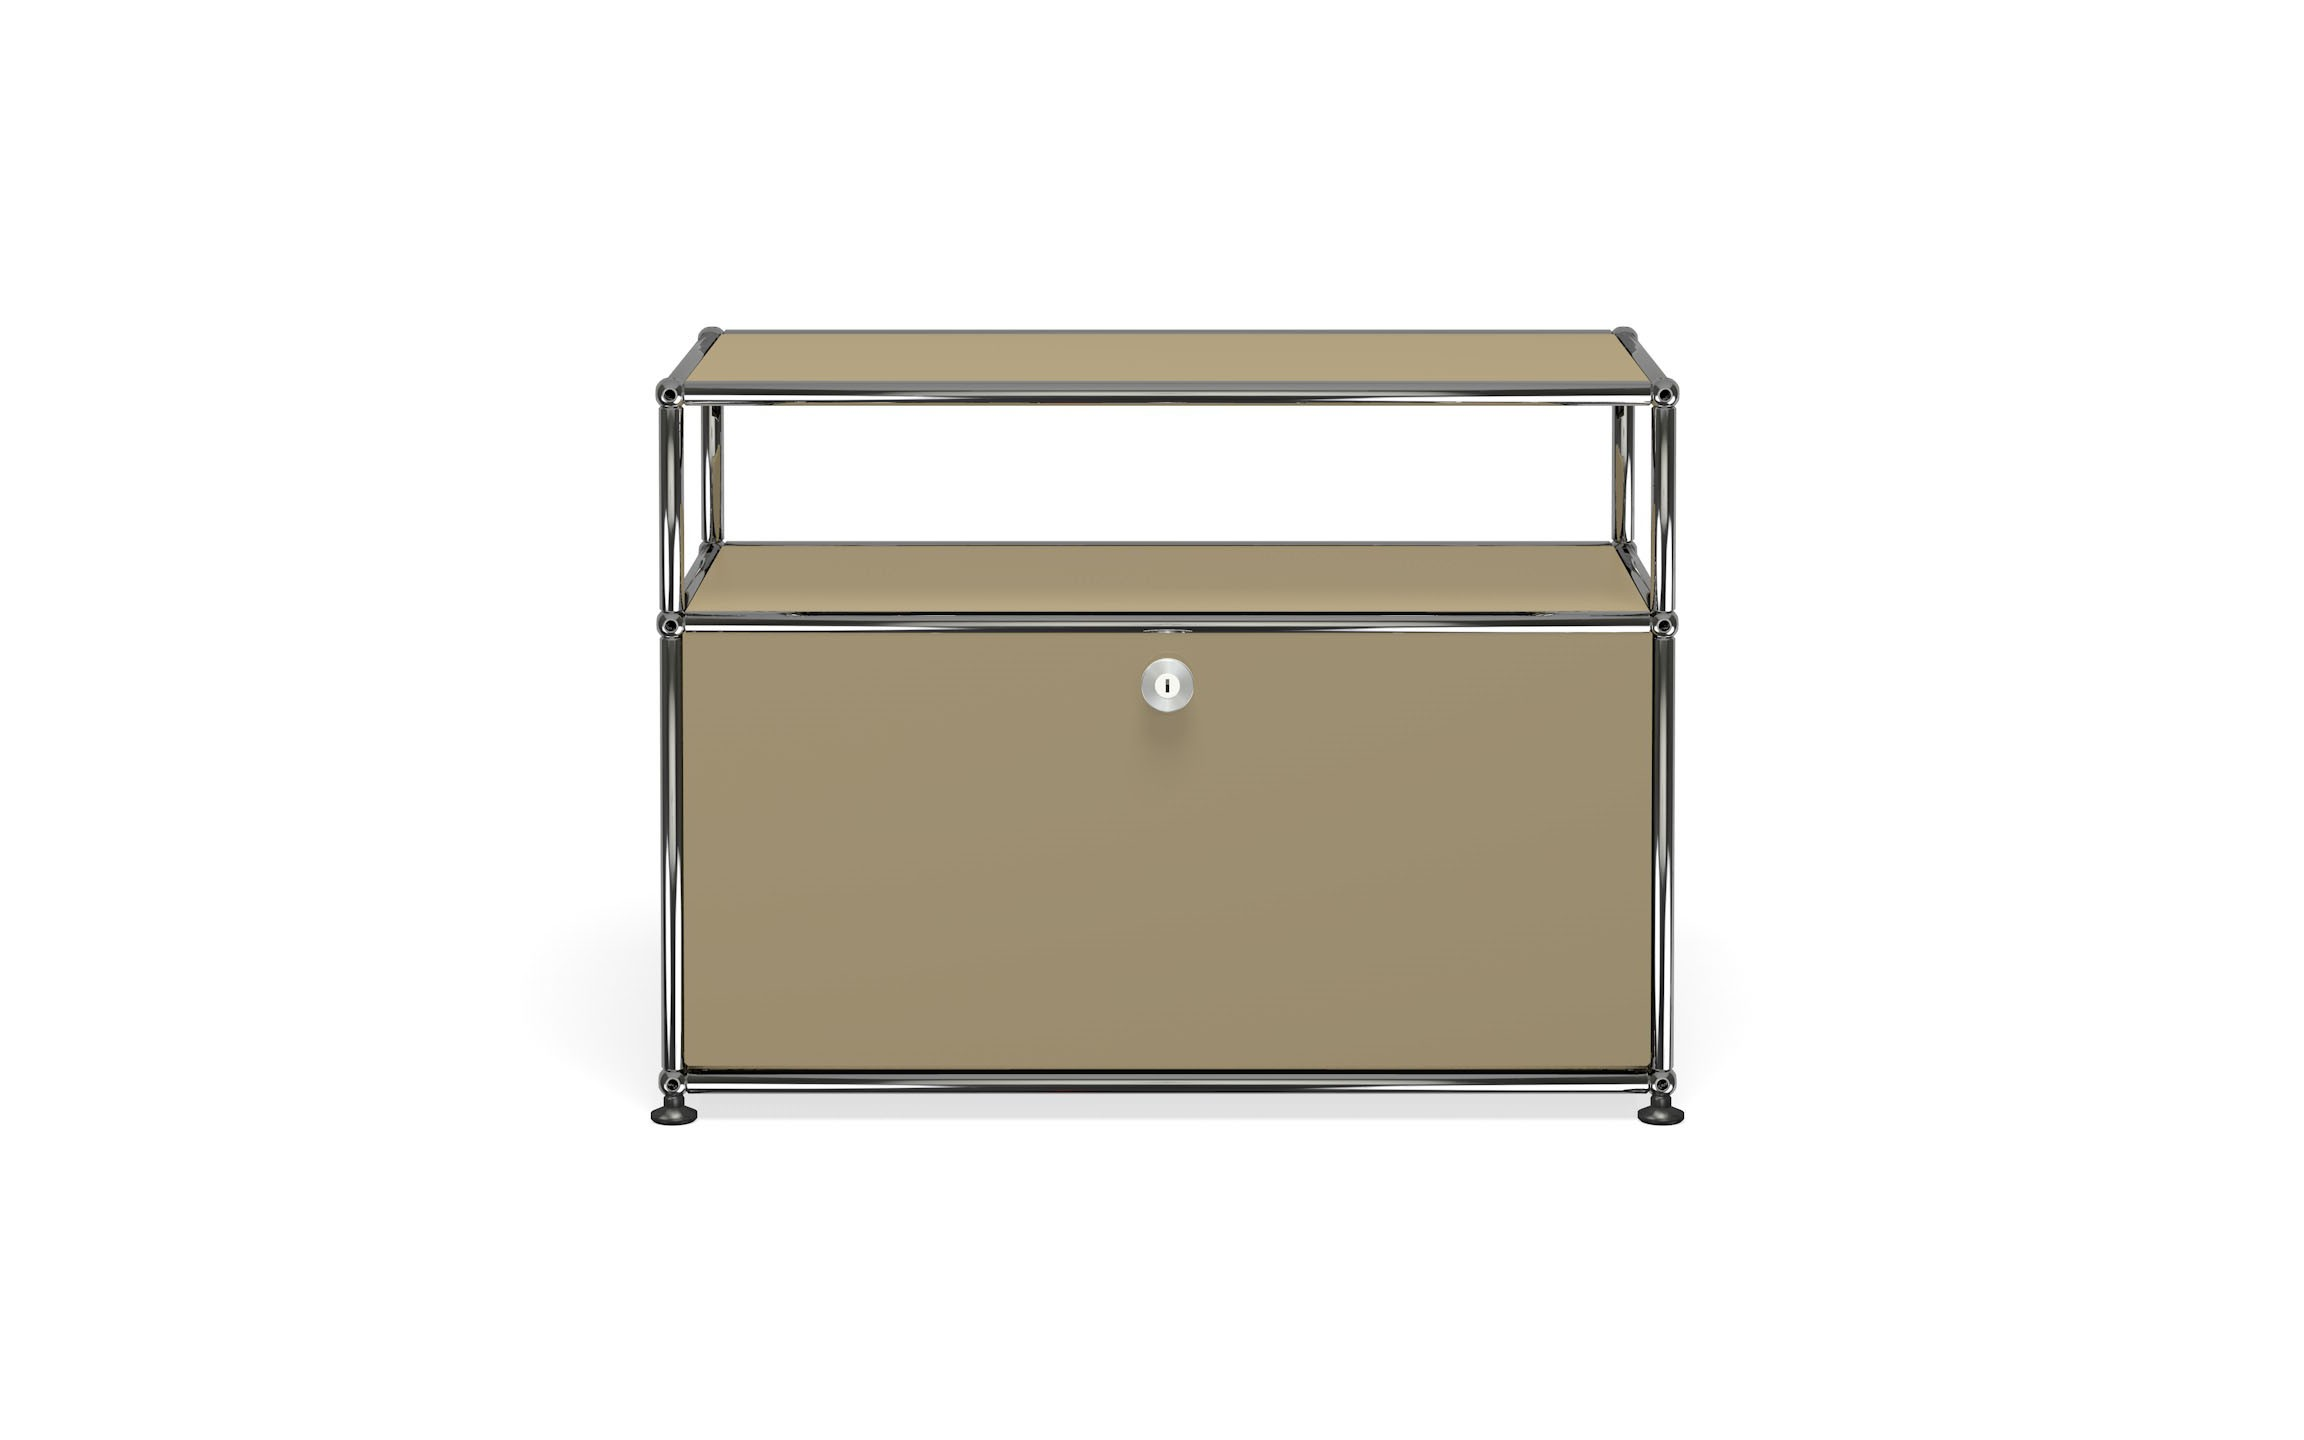 Petit meuble de rangement usm haller m6 beige usm - Petit meuble rangement ...